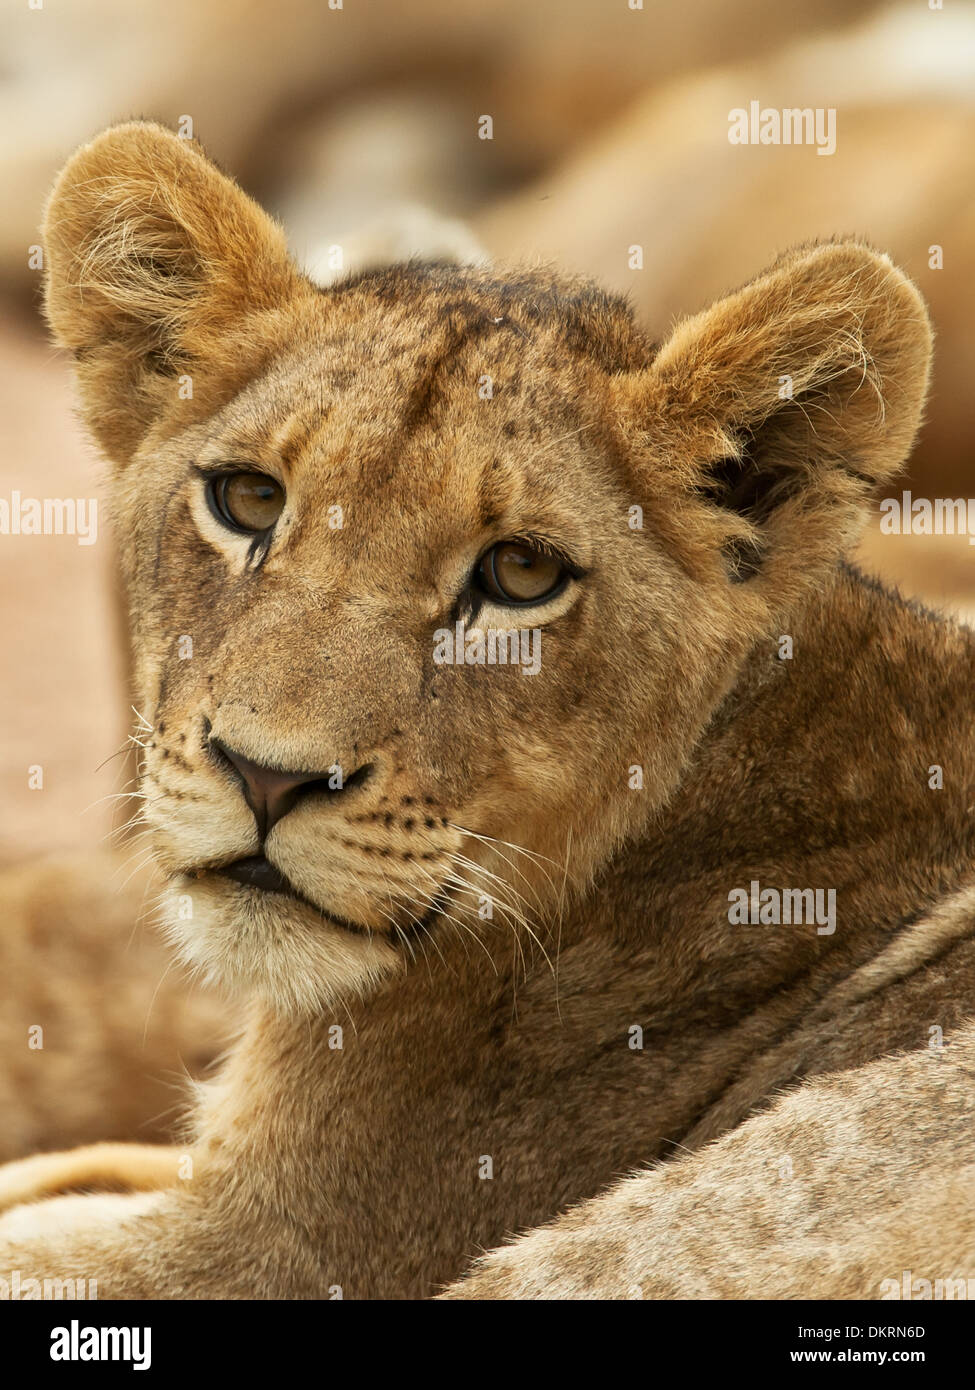 Lion, big 5, Panthera Leo, - Stock Image